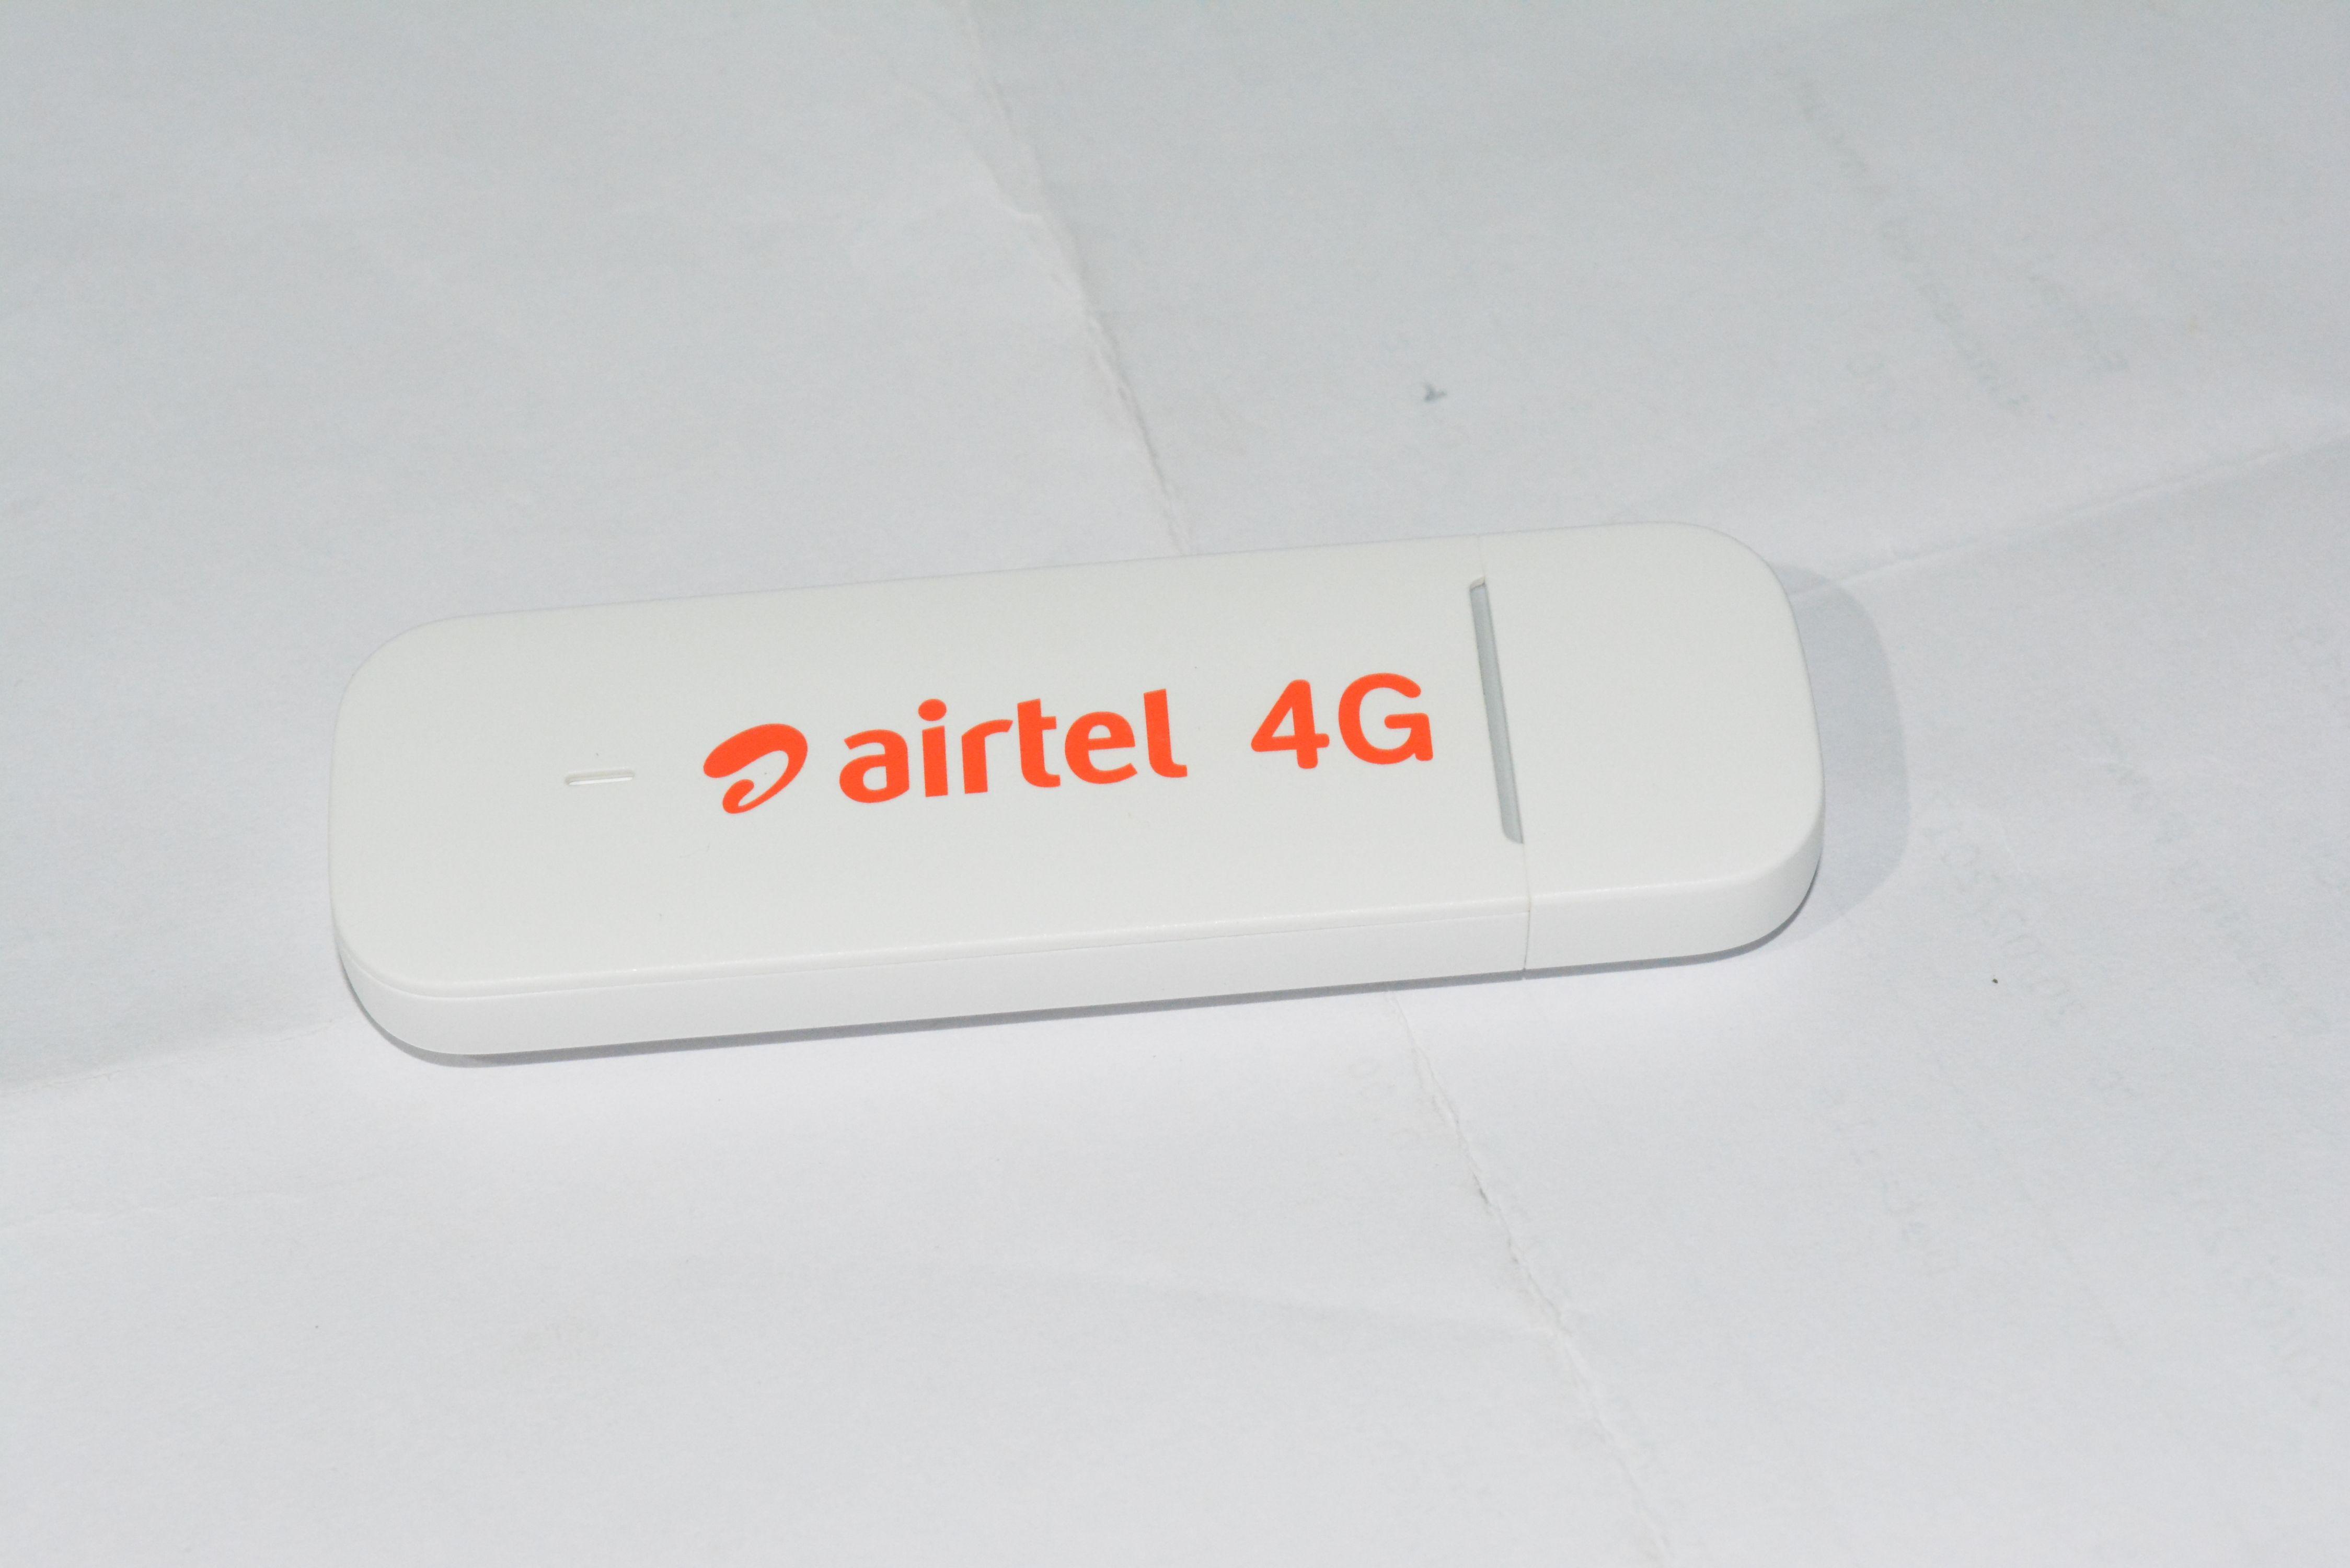 Airtel E3372 Dongle 2G 3G 4G LTE USB Datacard Modem at Rs 1399/piece |  Bhatli Road | Bargarh| ID: 16133130262